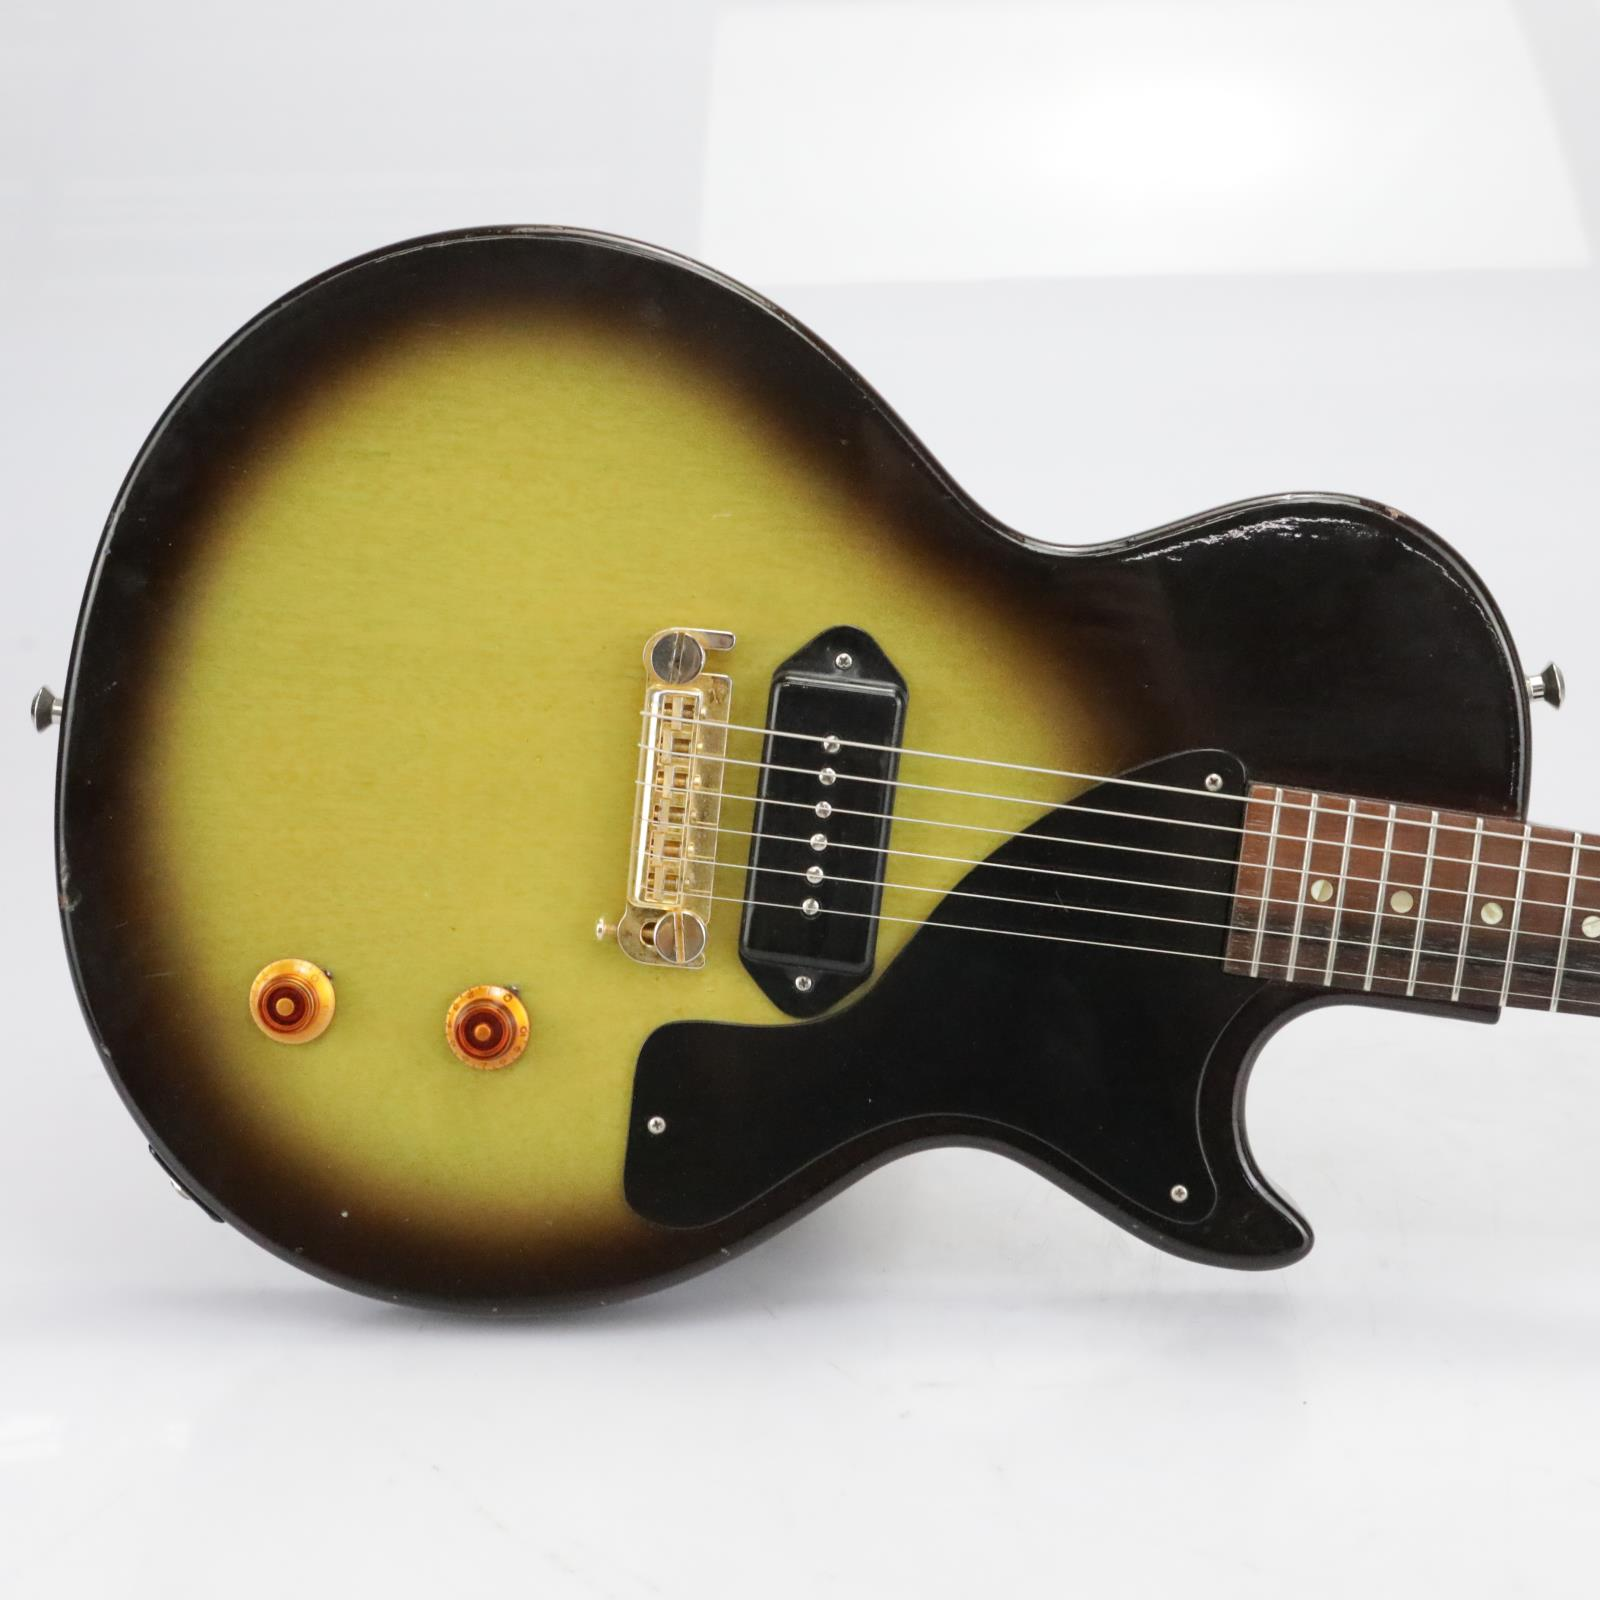 1956 Gibson Les Paul Junior LP Jr Tobacco Burst Refin #40154